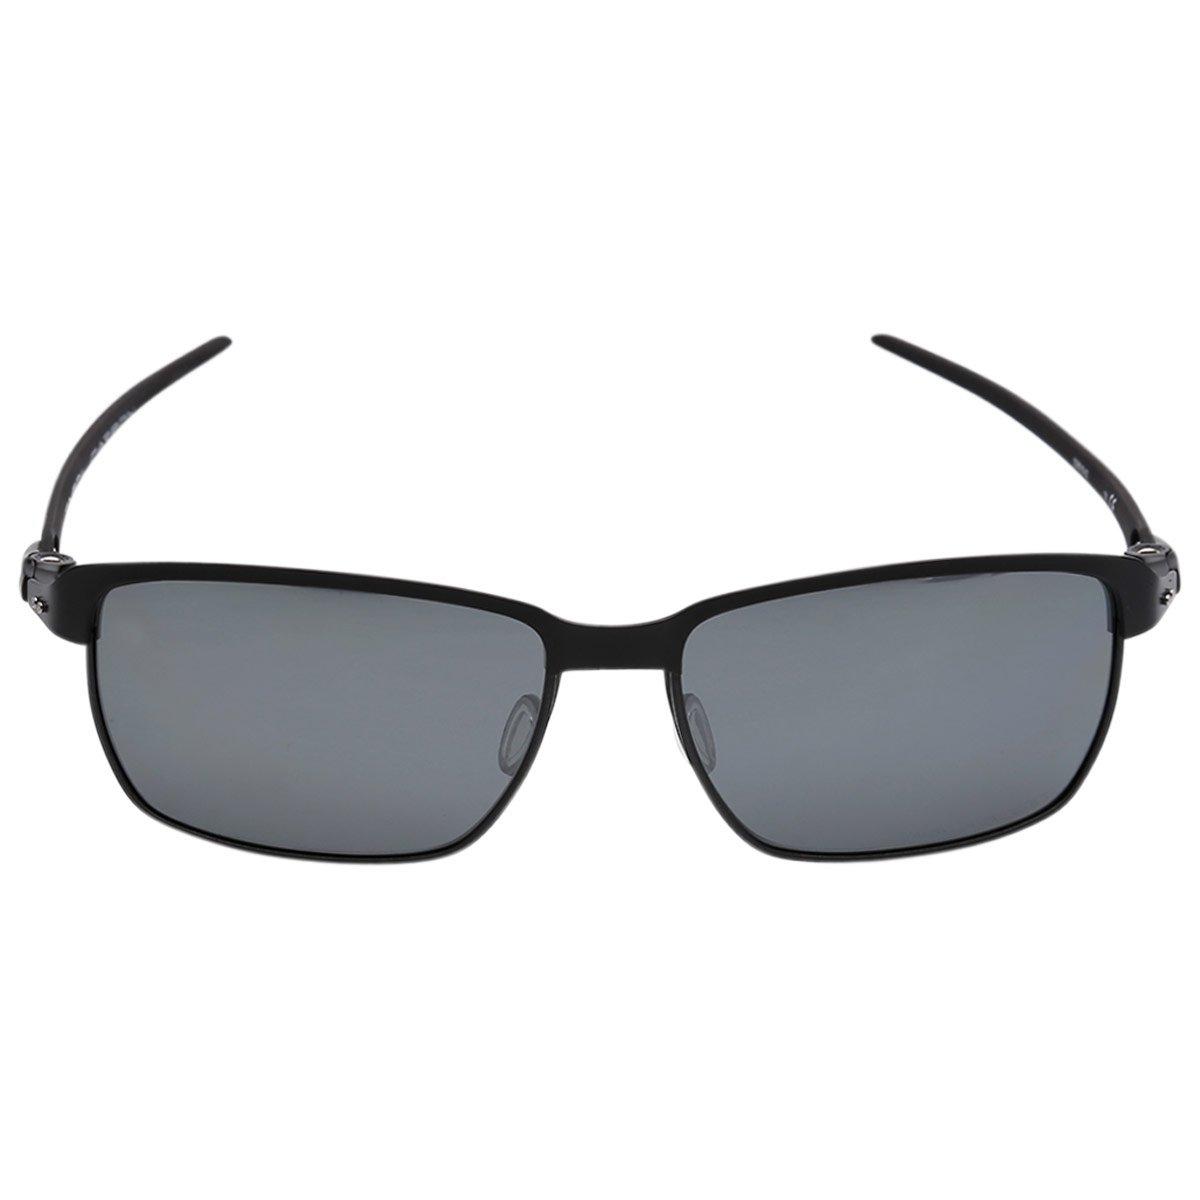 Óculos Oakley Tinfoil Carbon  Óculos Oakley Tinfoil Carbon ... 7e949bc0de